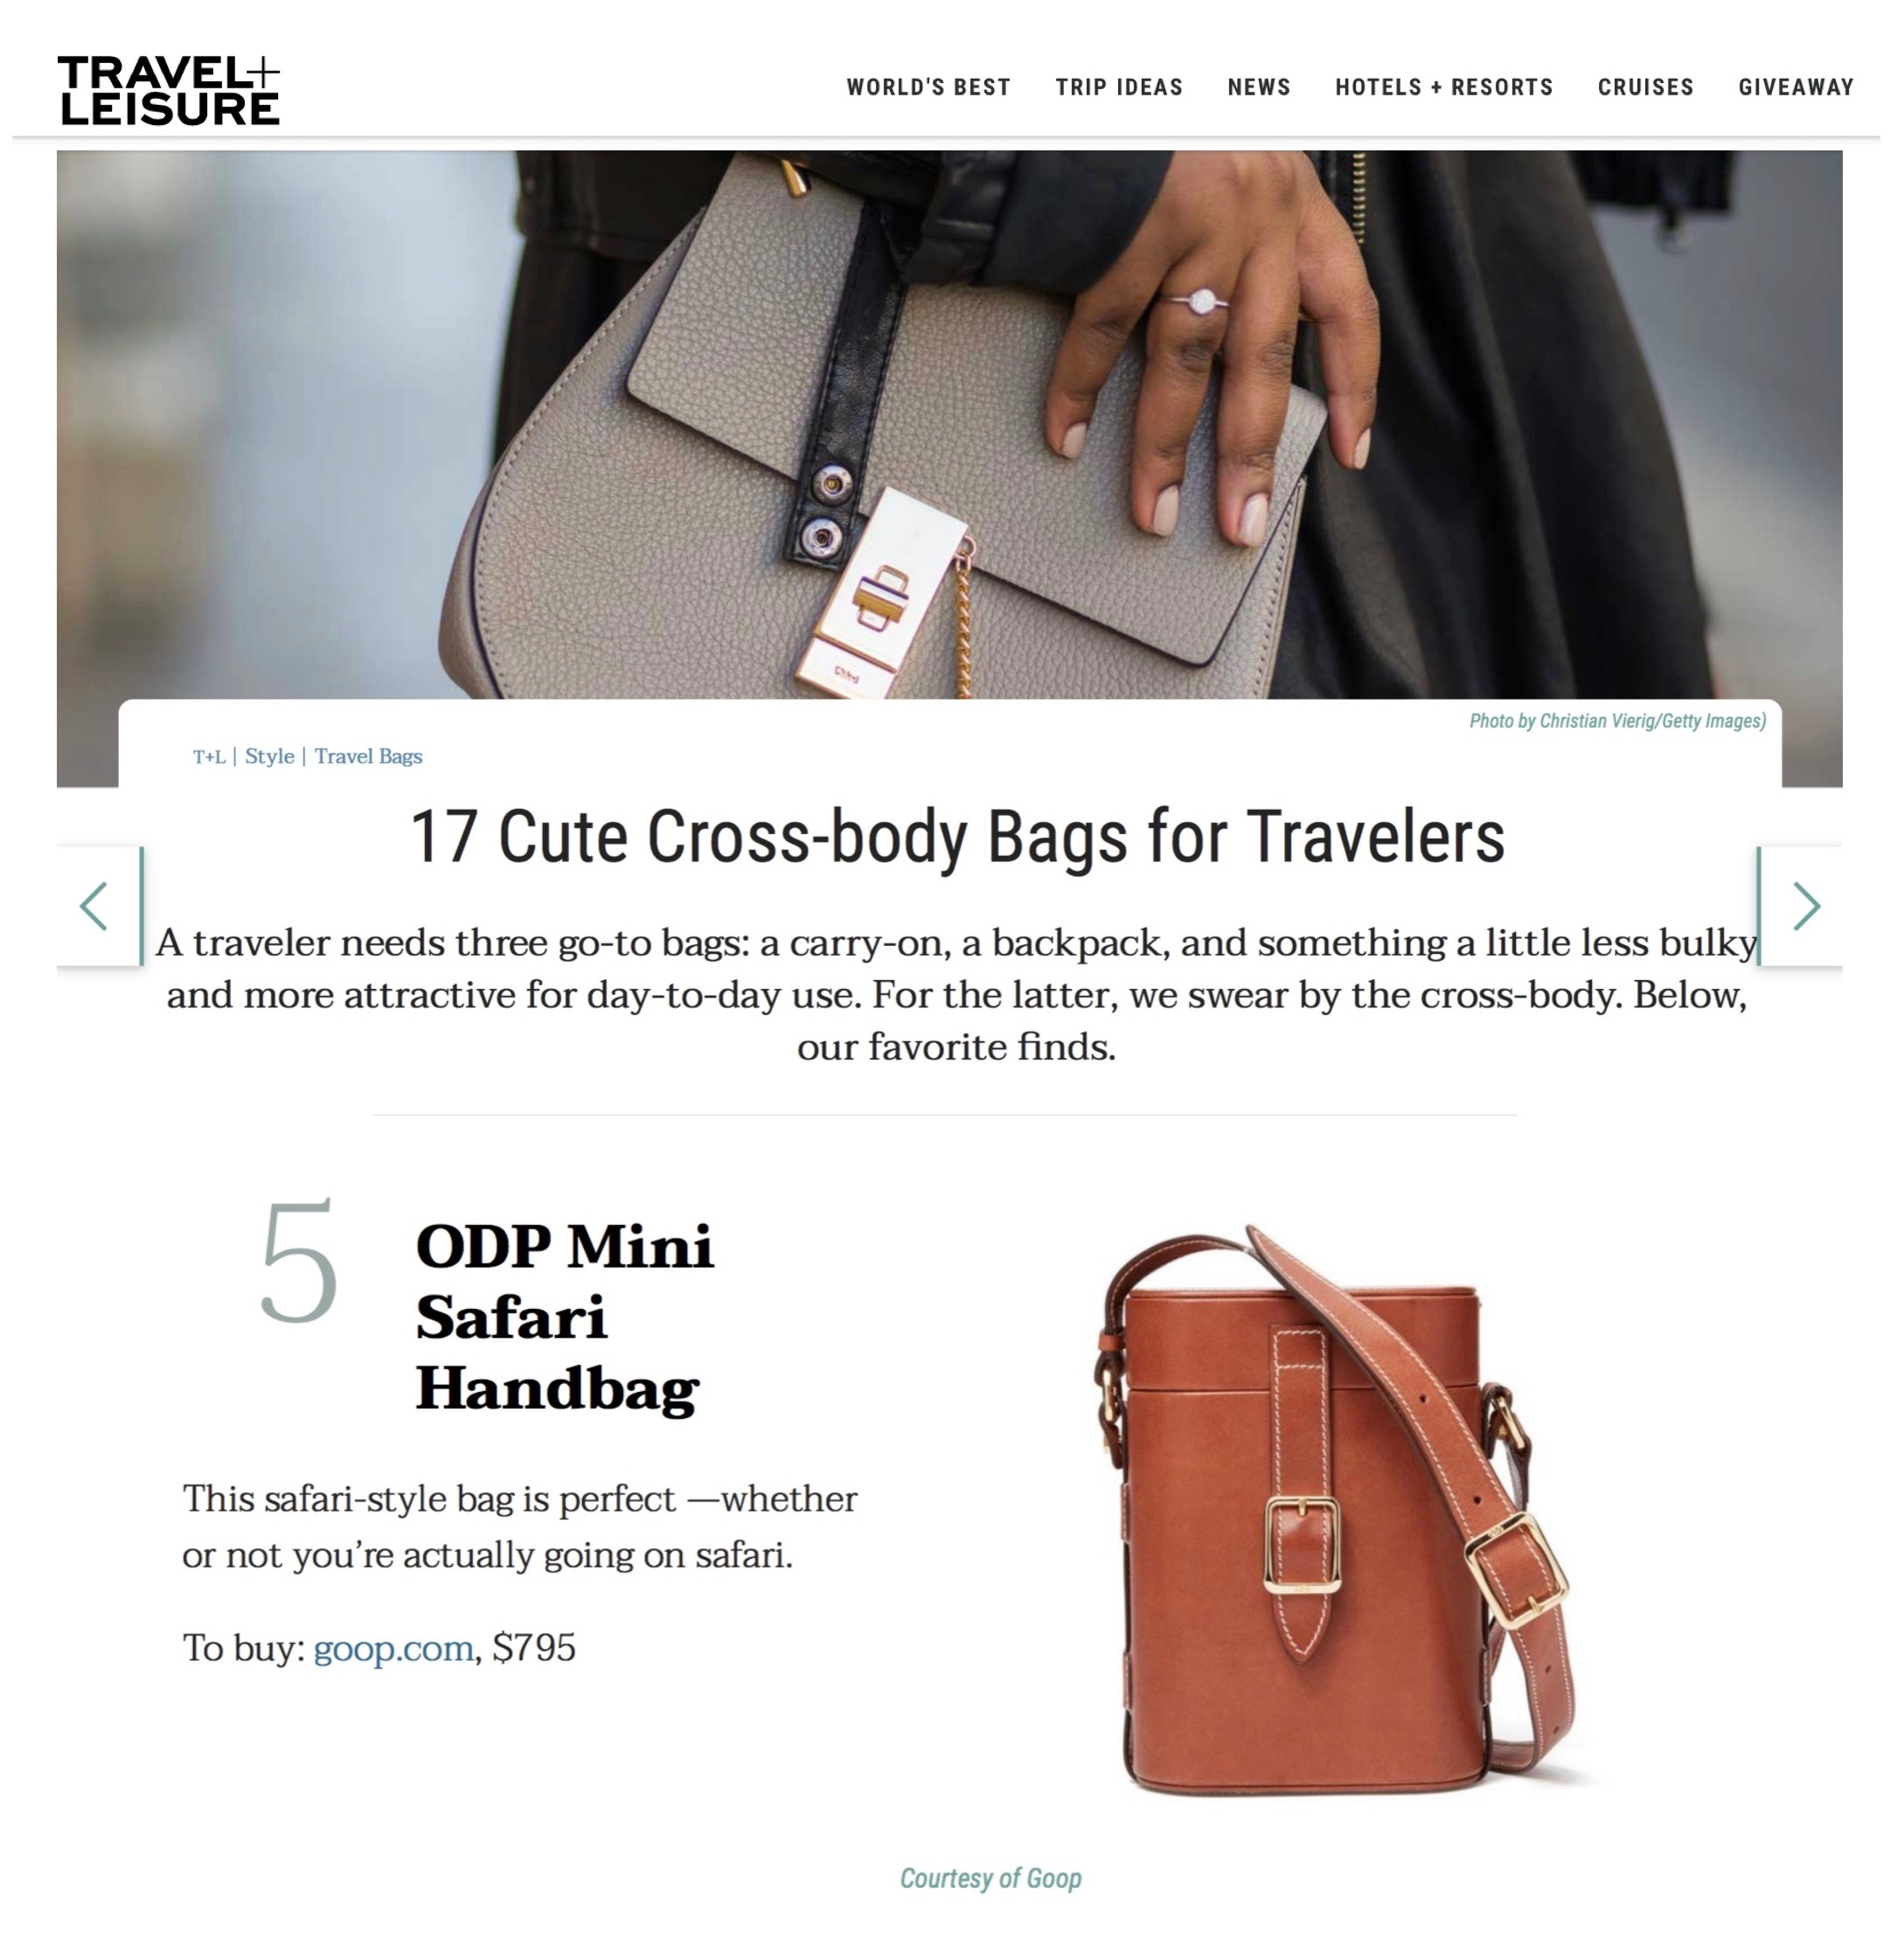 T&L_ODP_MiniSafari_Bag 2.jpg